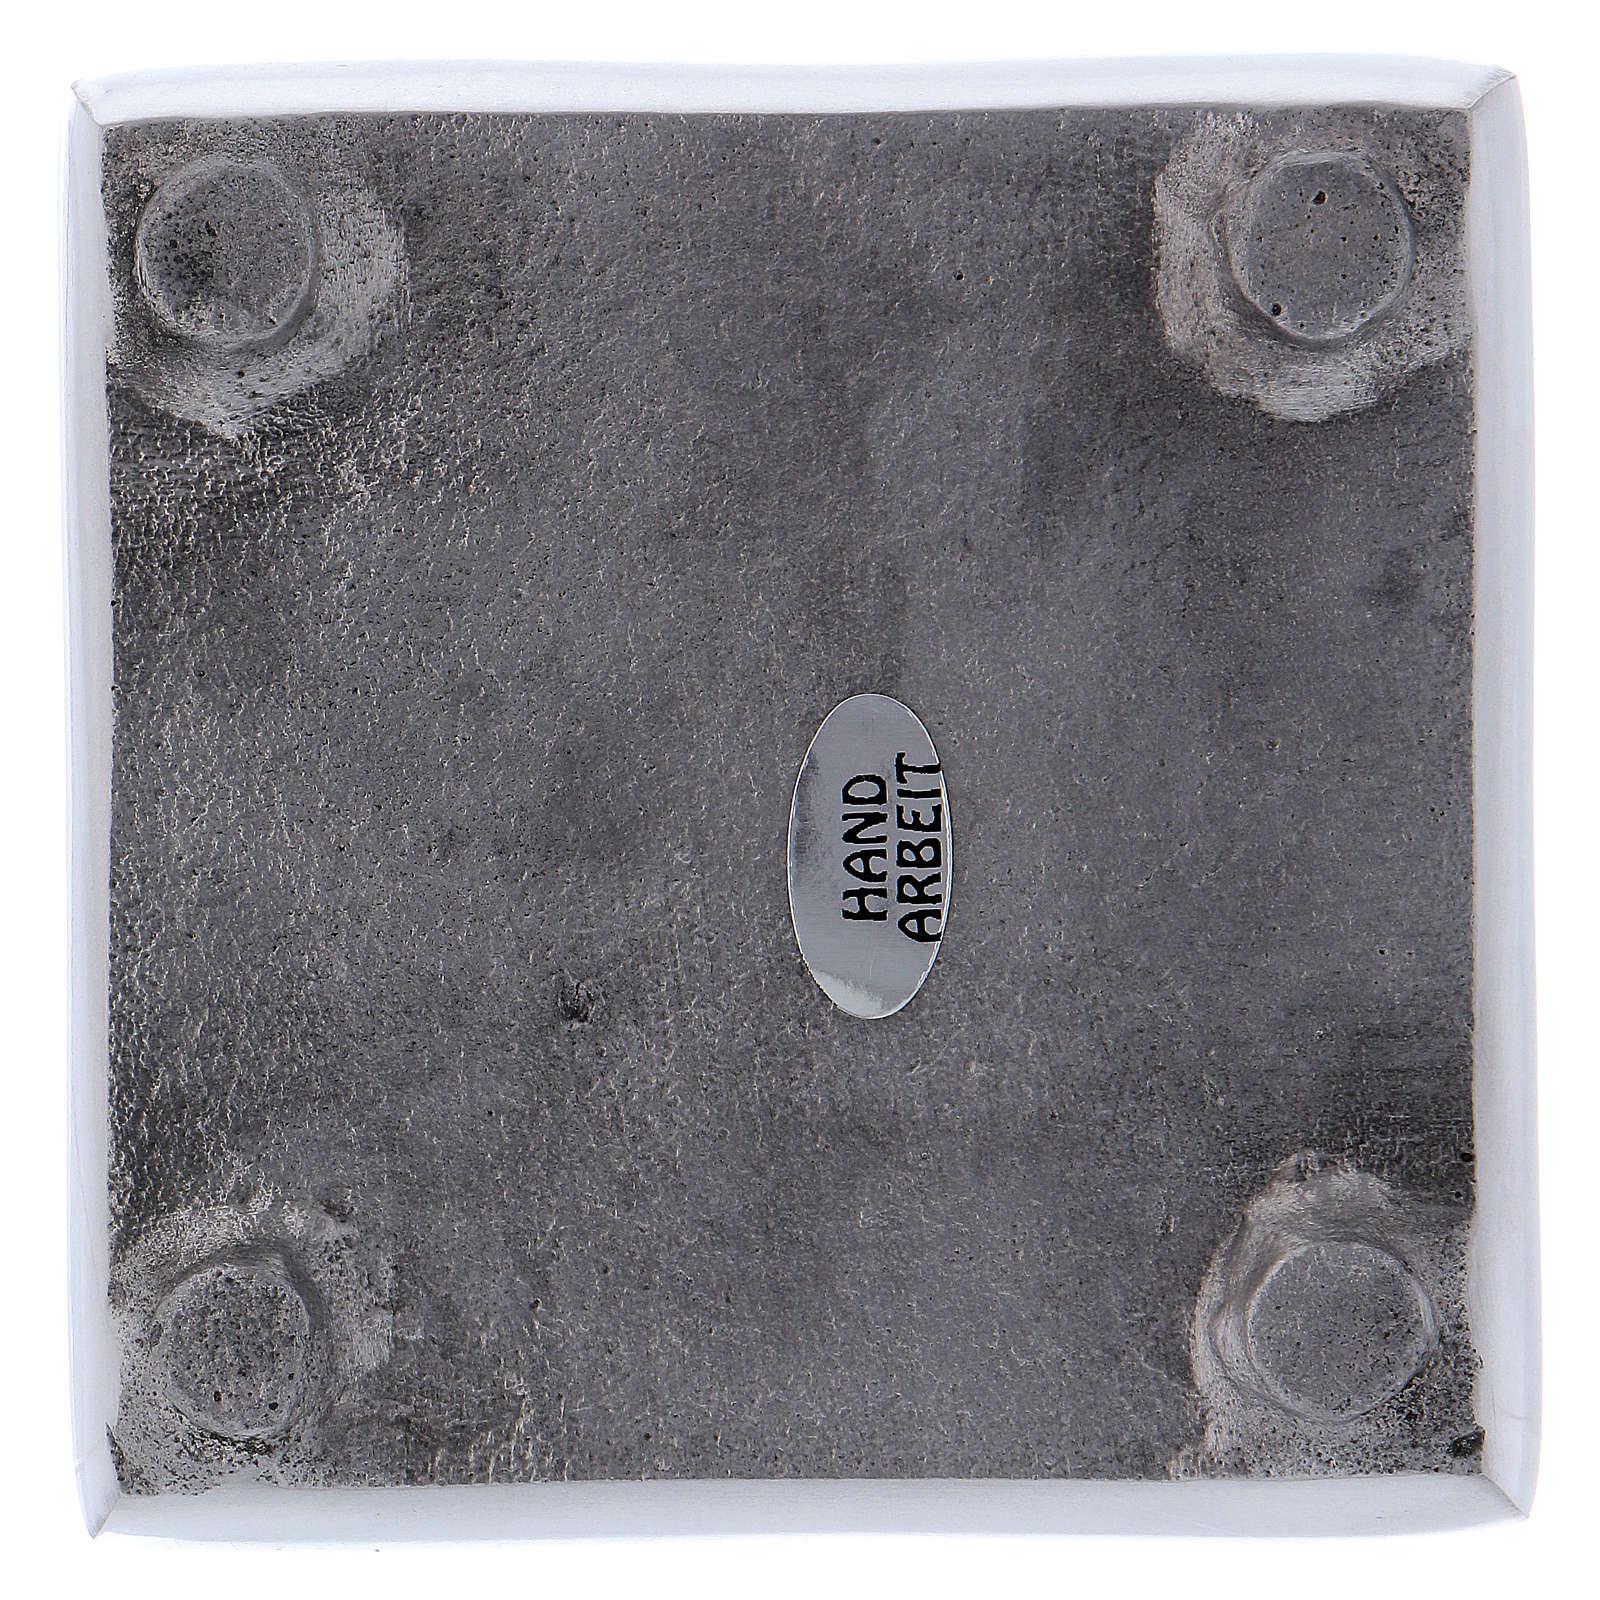 Portacandela stile moderno quadrato ottone argentato 8 cm 3